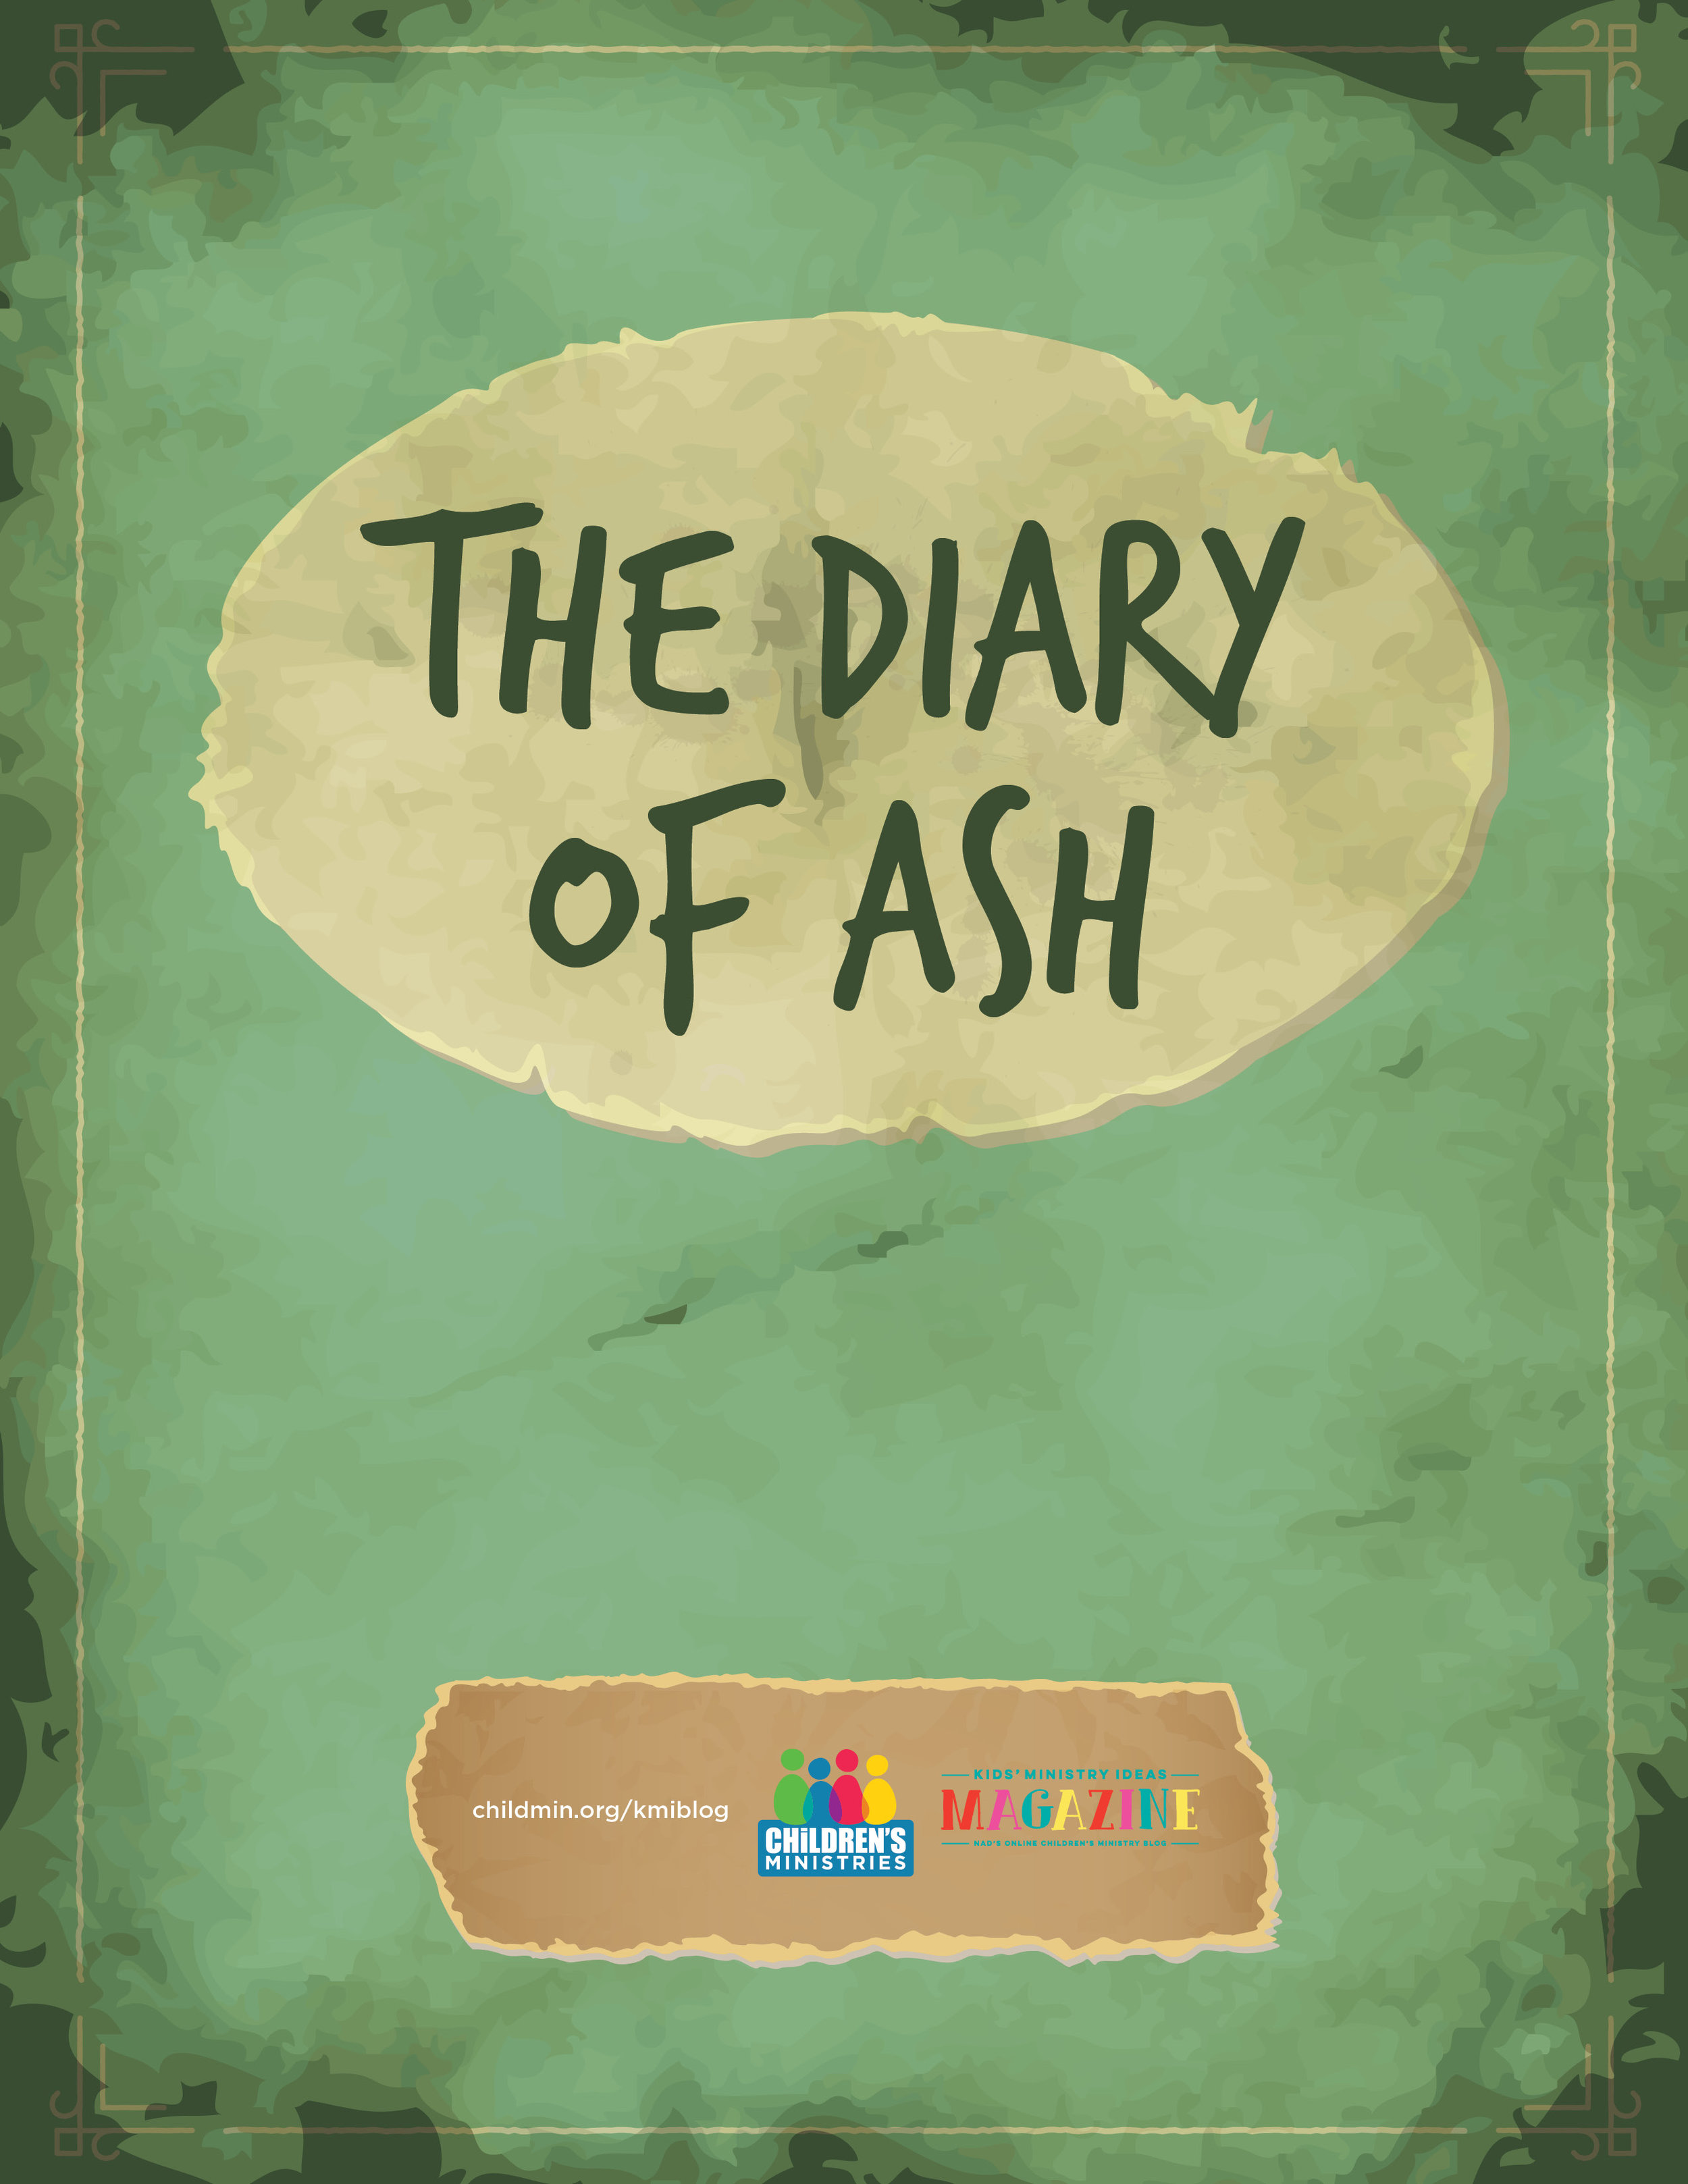 NAD_DiaryofAsh_Cover.jpg